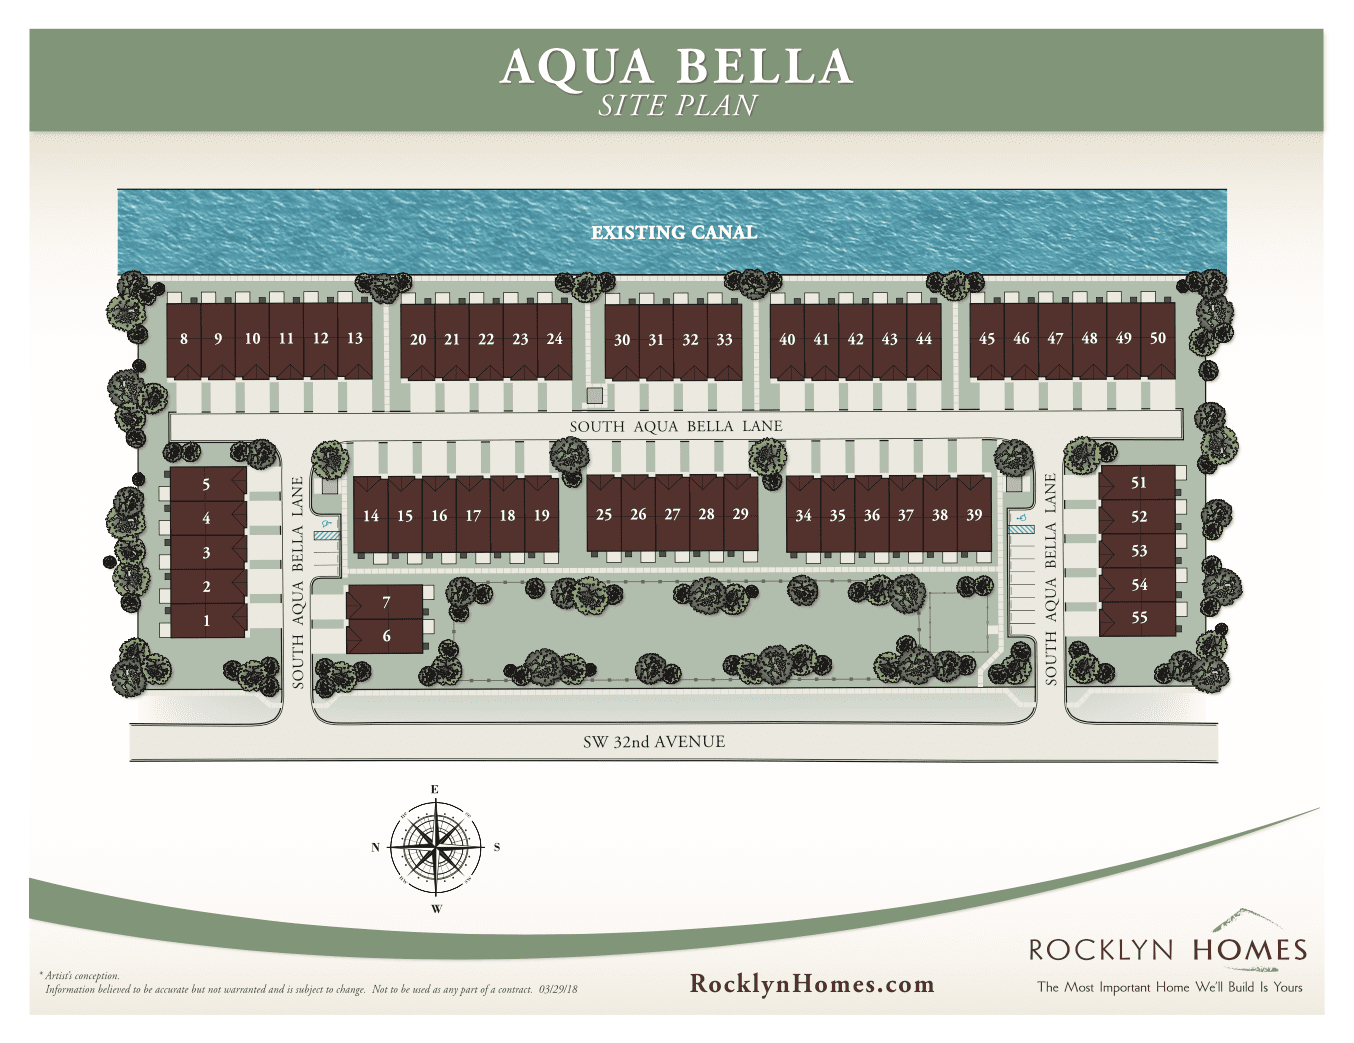 AquaBella Site Plan